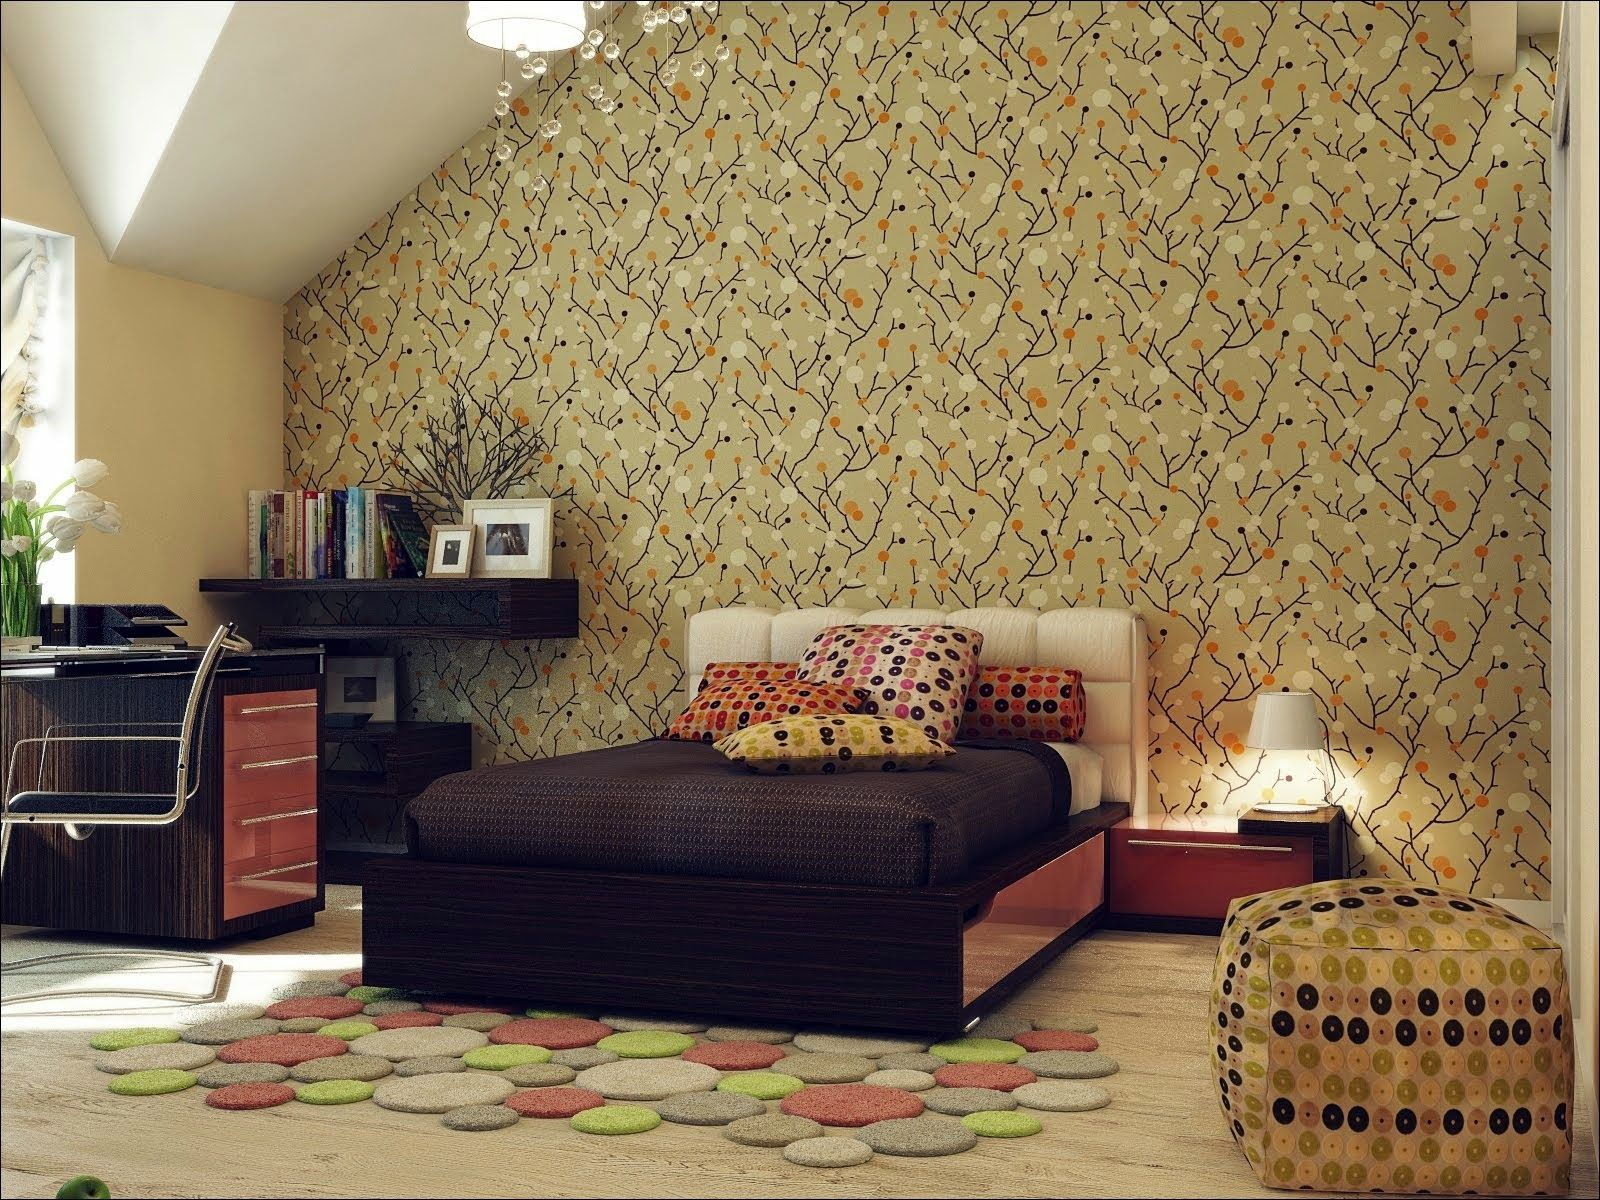 Bedroom Wallpaper Bedroom Wallpapers Hd Bedroom Wallpaper Ideas